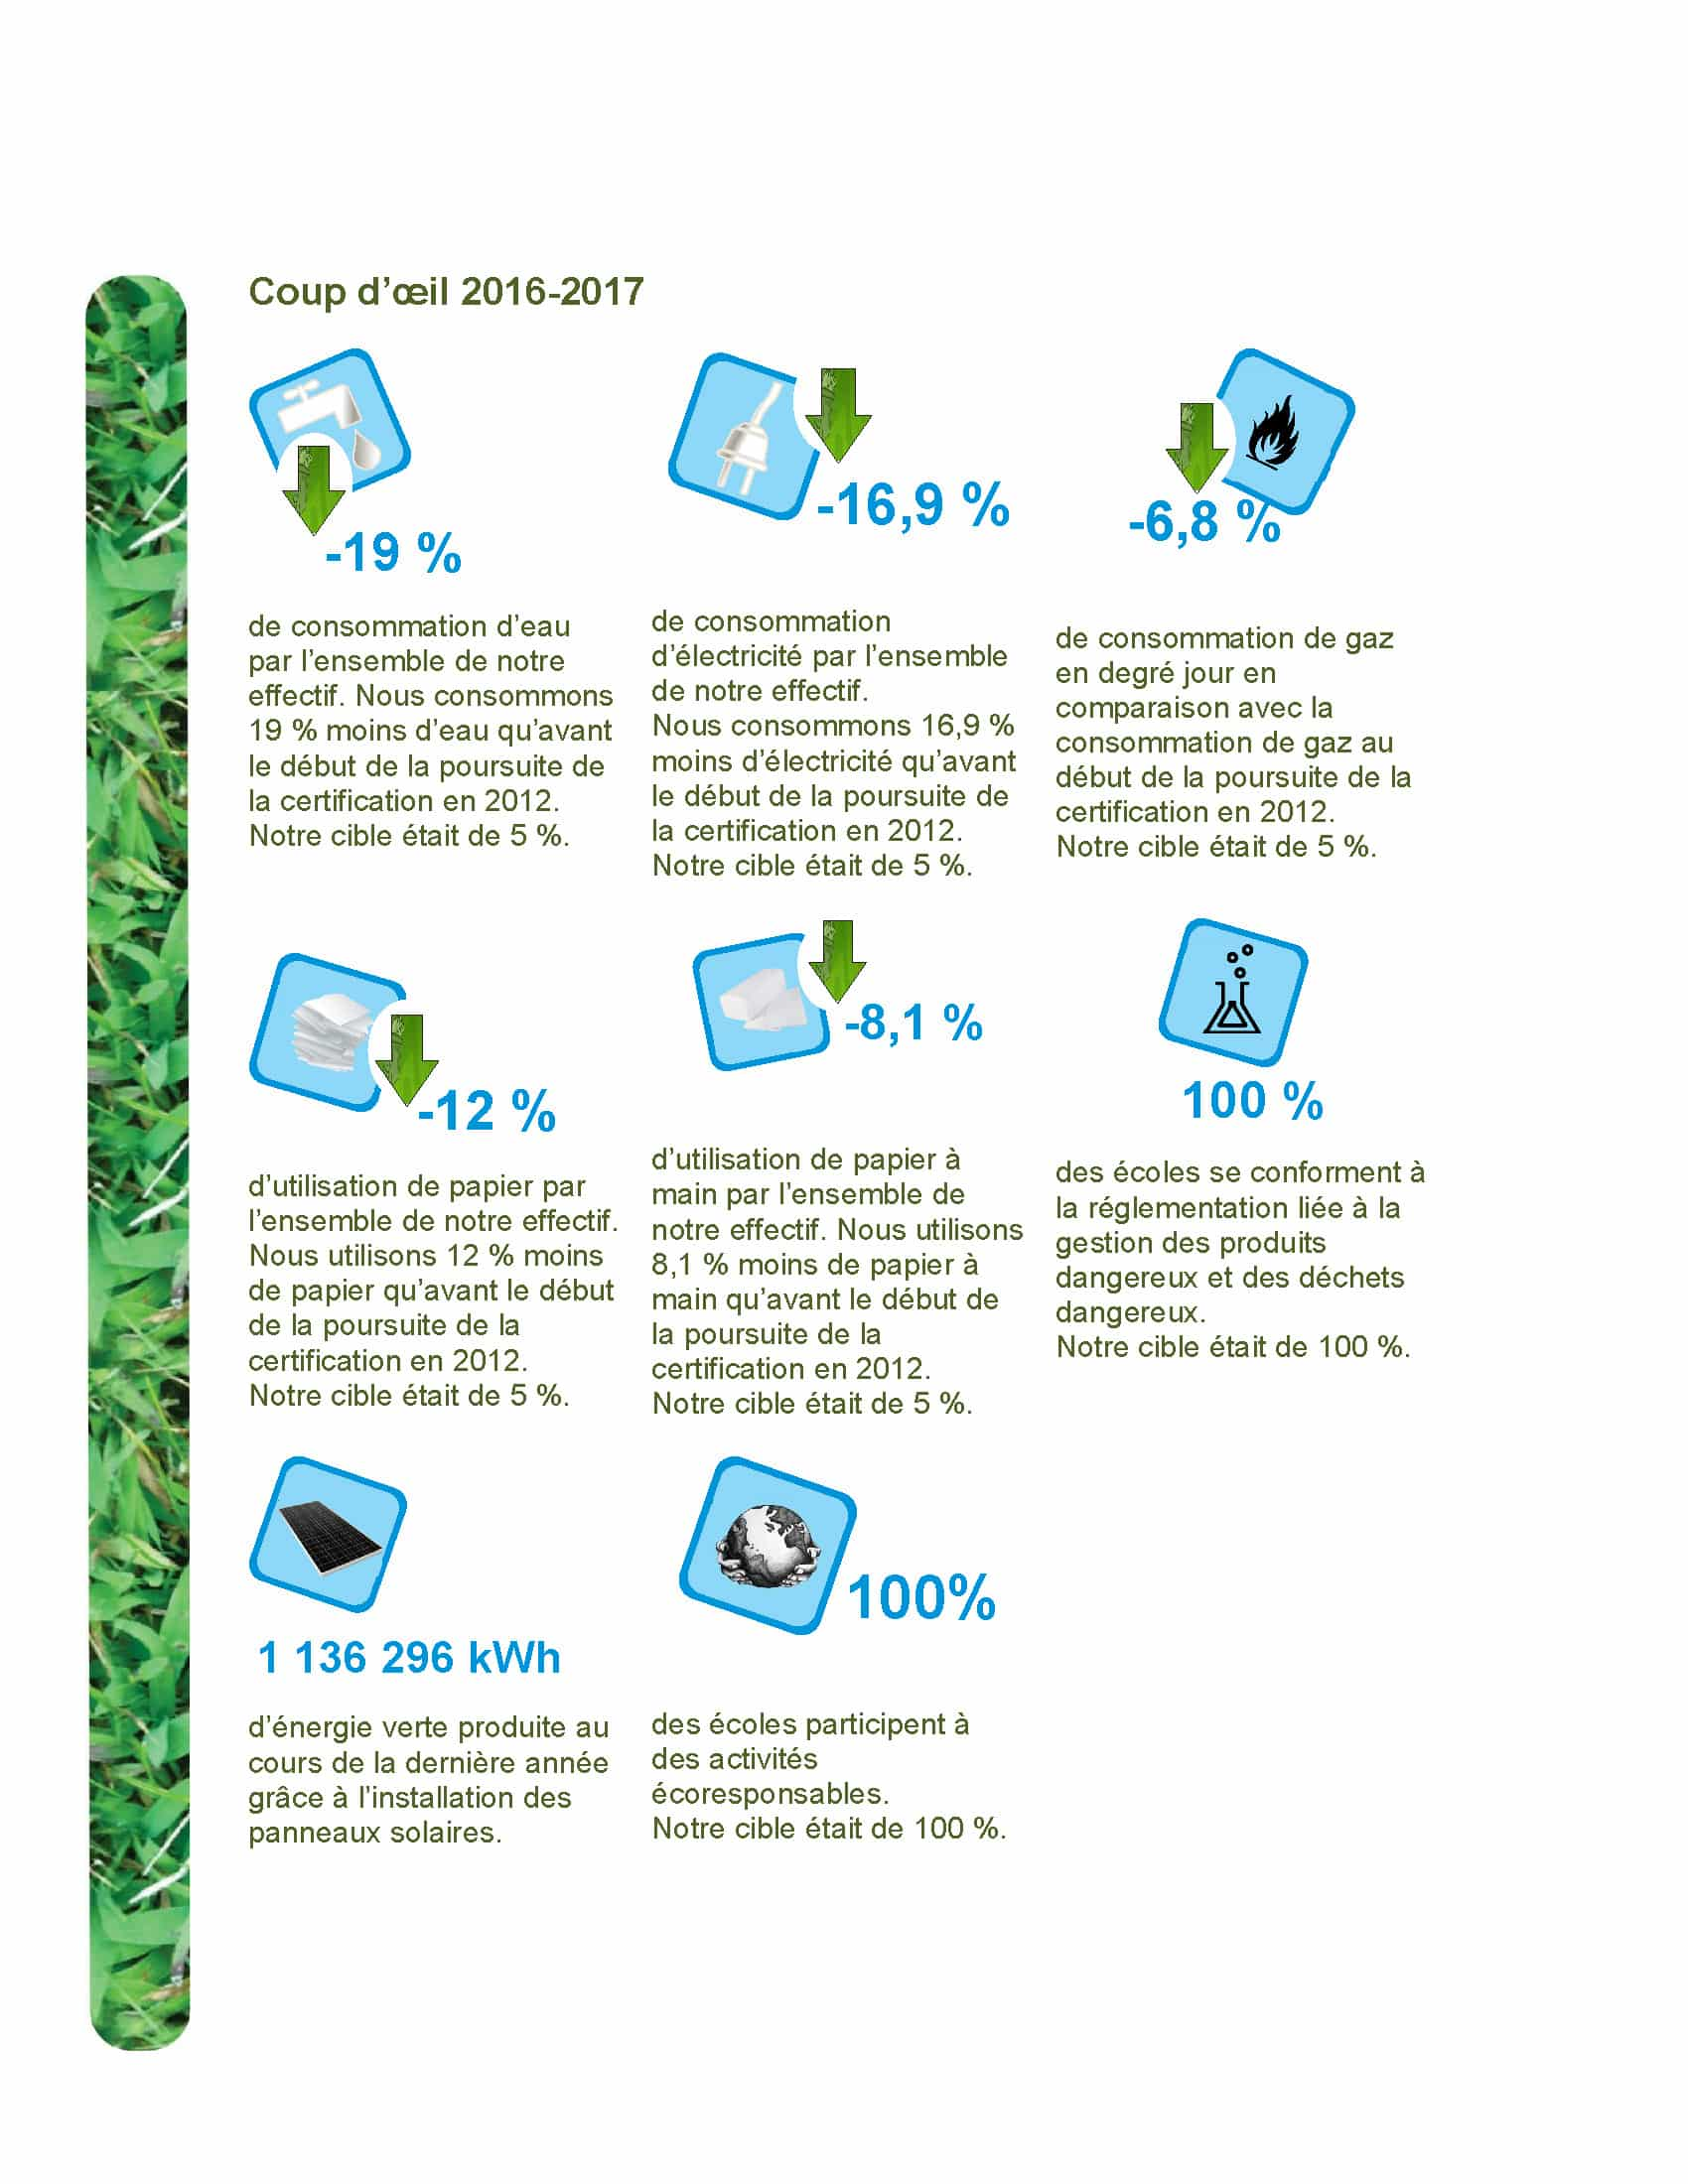 Rapport-annuel-de-performance-2016-2017final-1-3.jpg